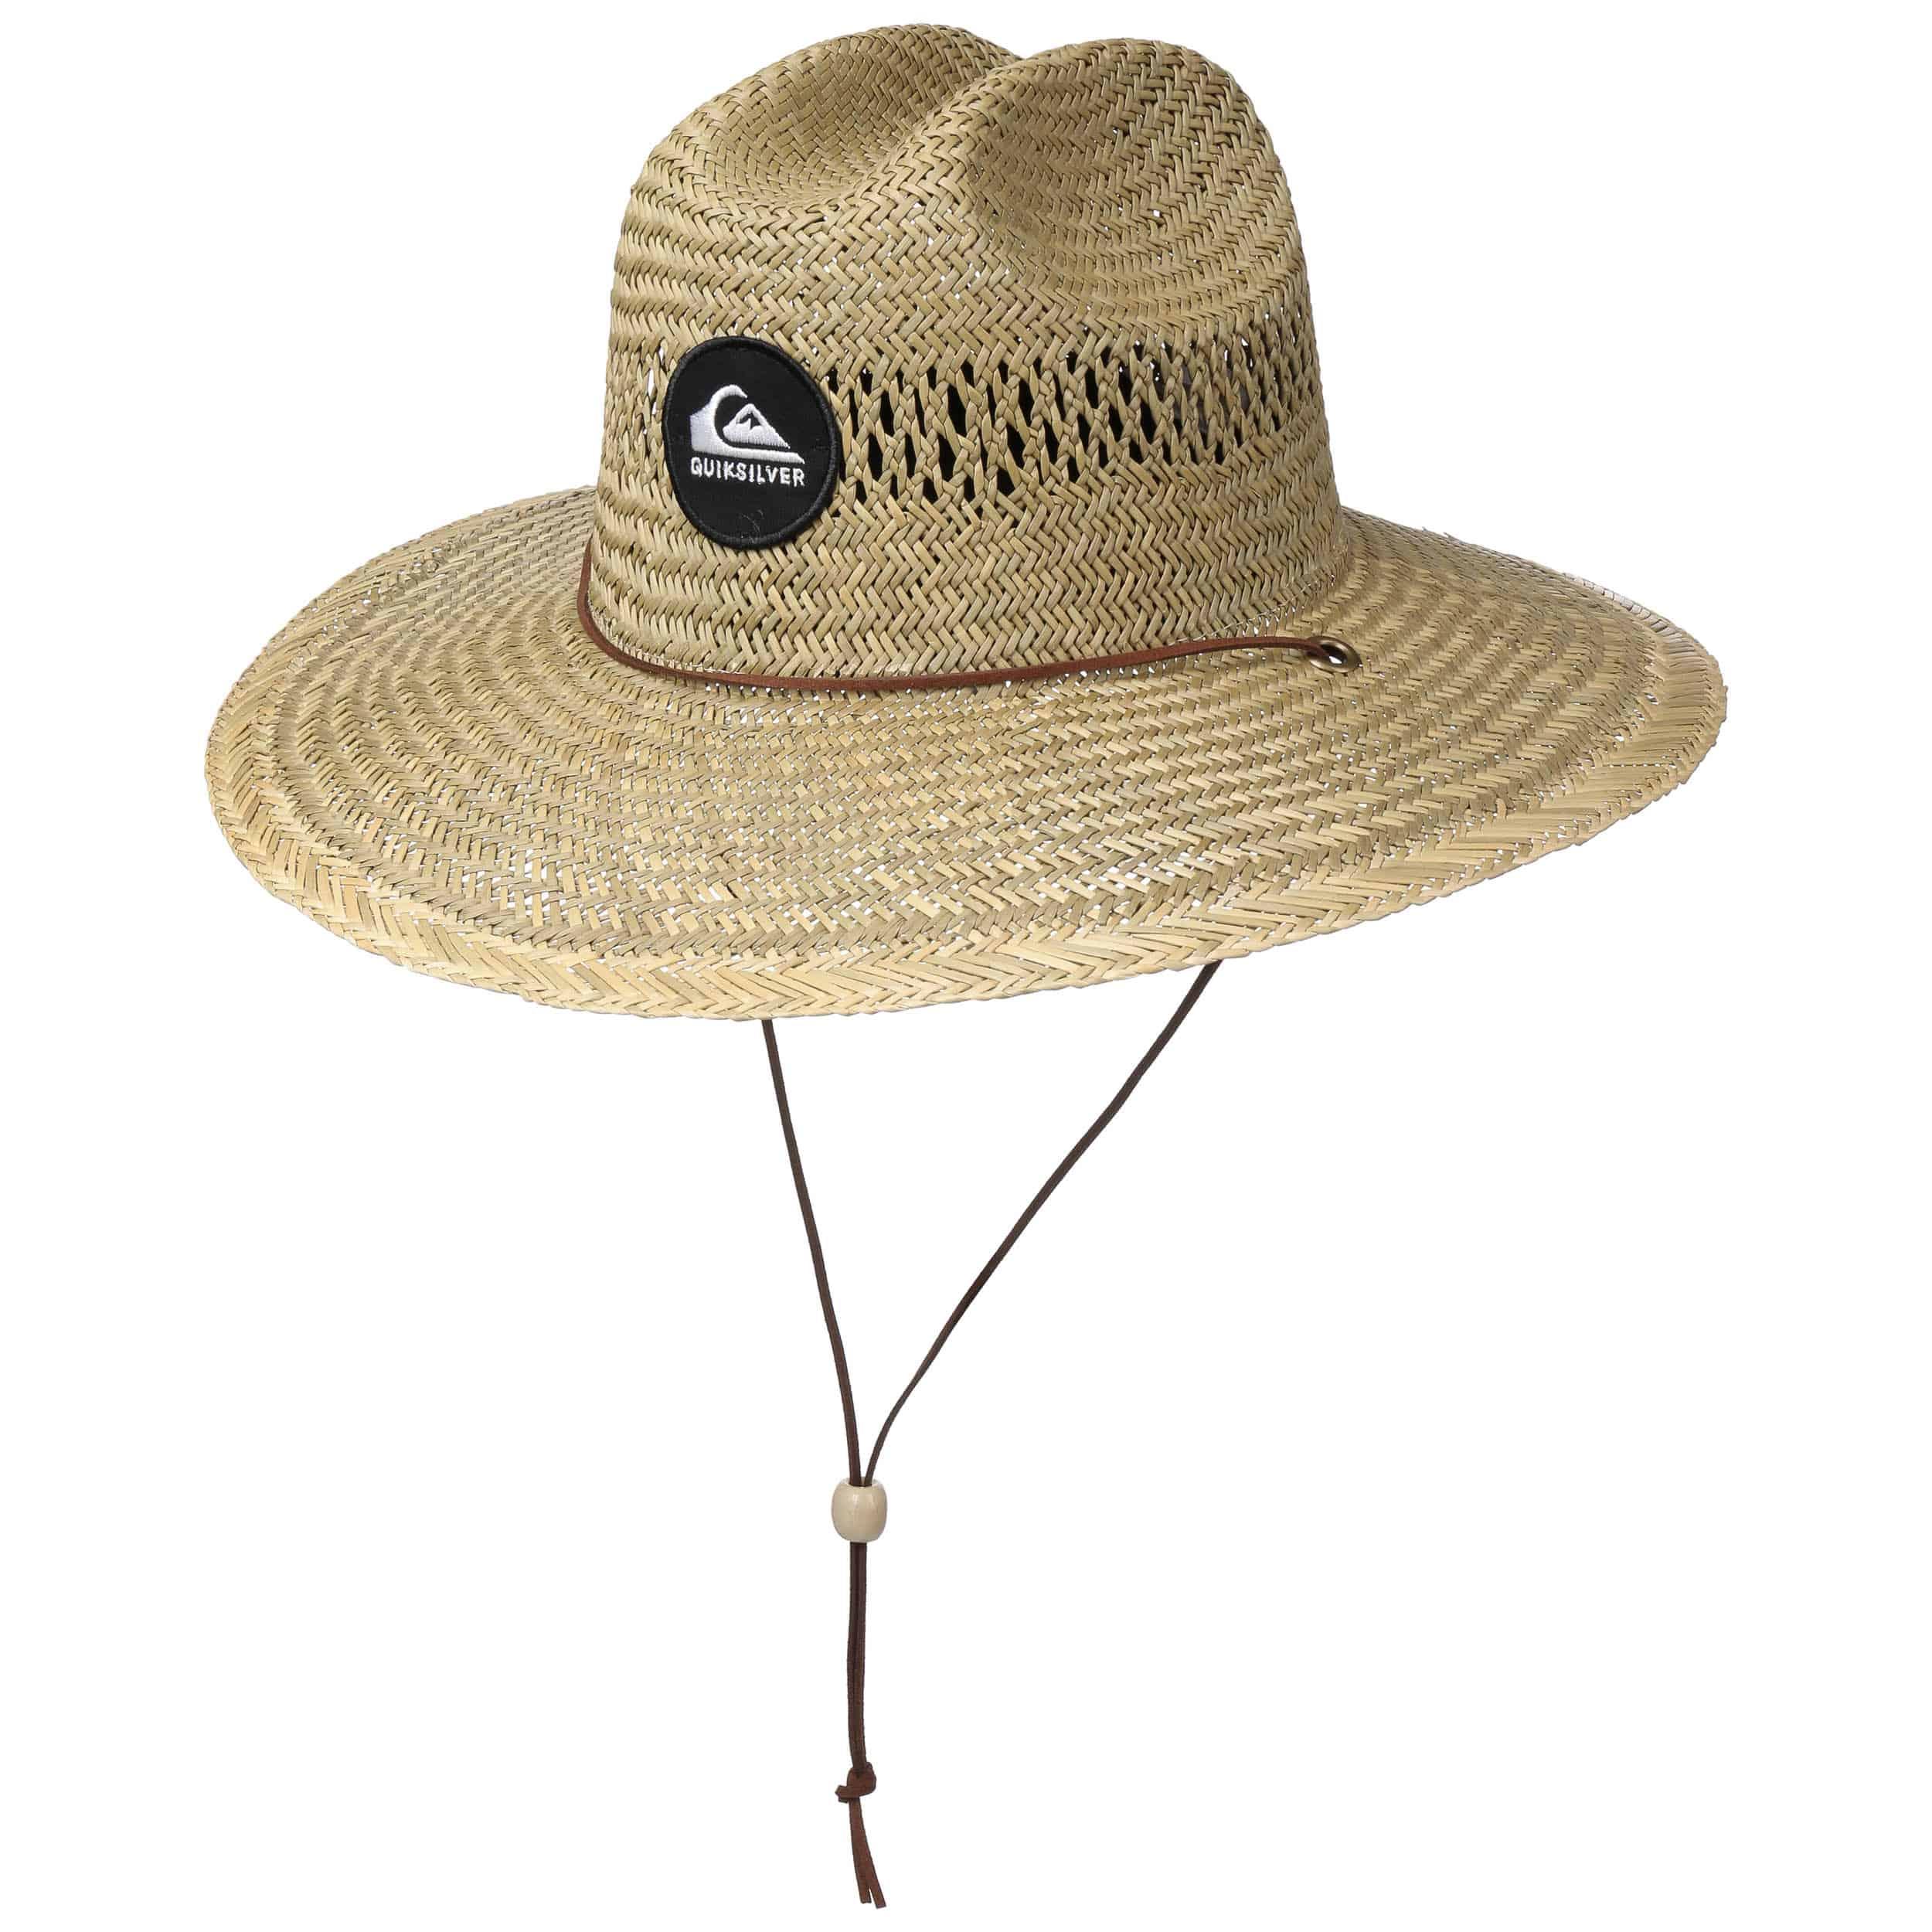 d63c20ad893 Lifeguard pierside straw hat quiksilver eur hats caps jpg 2500x2500 Pierside  hat